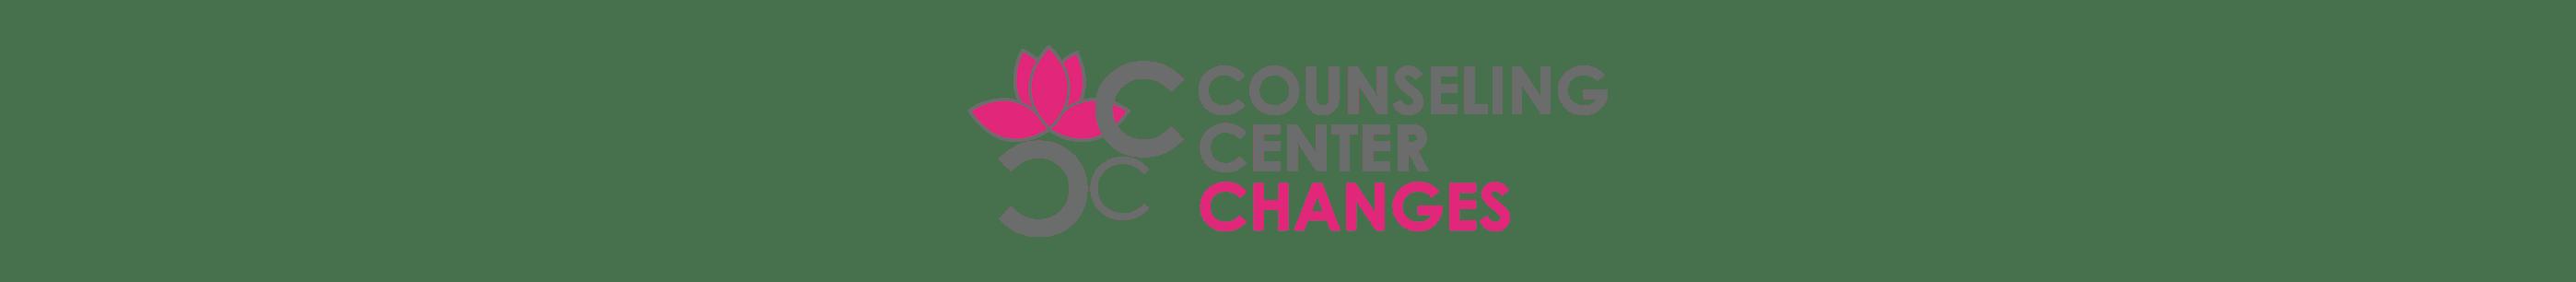 logo-ccc-sales-page-boek